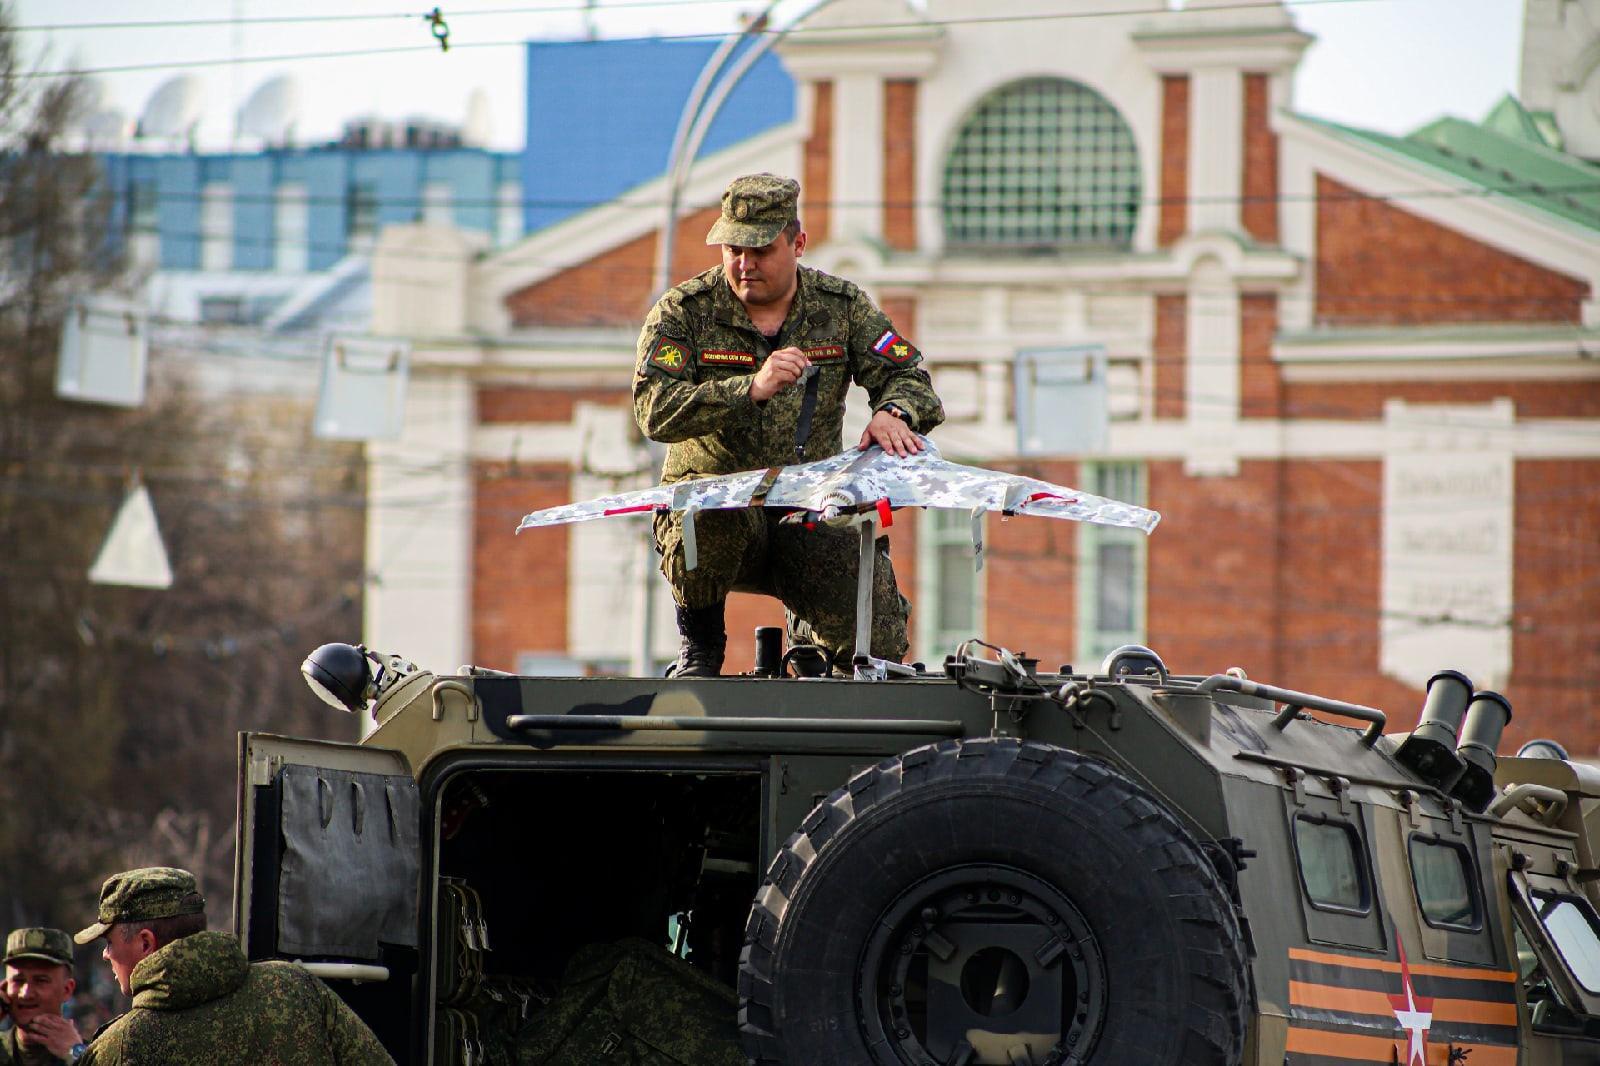 Фото Флаги, форма, техника, толпы зрителей: лучшие фото с репетиции парада в Новосибирске 10